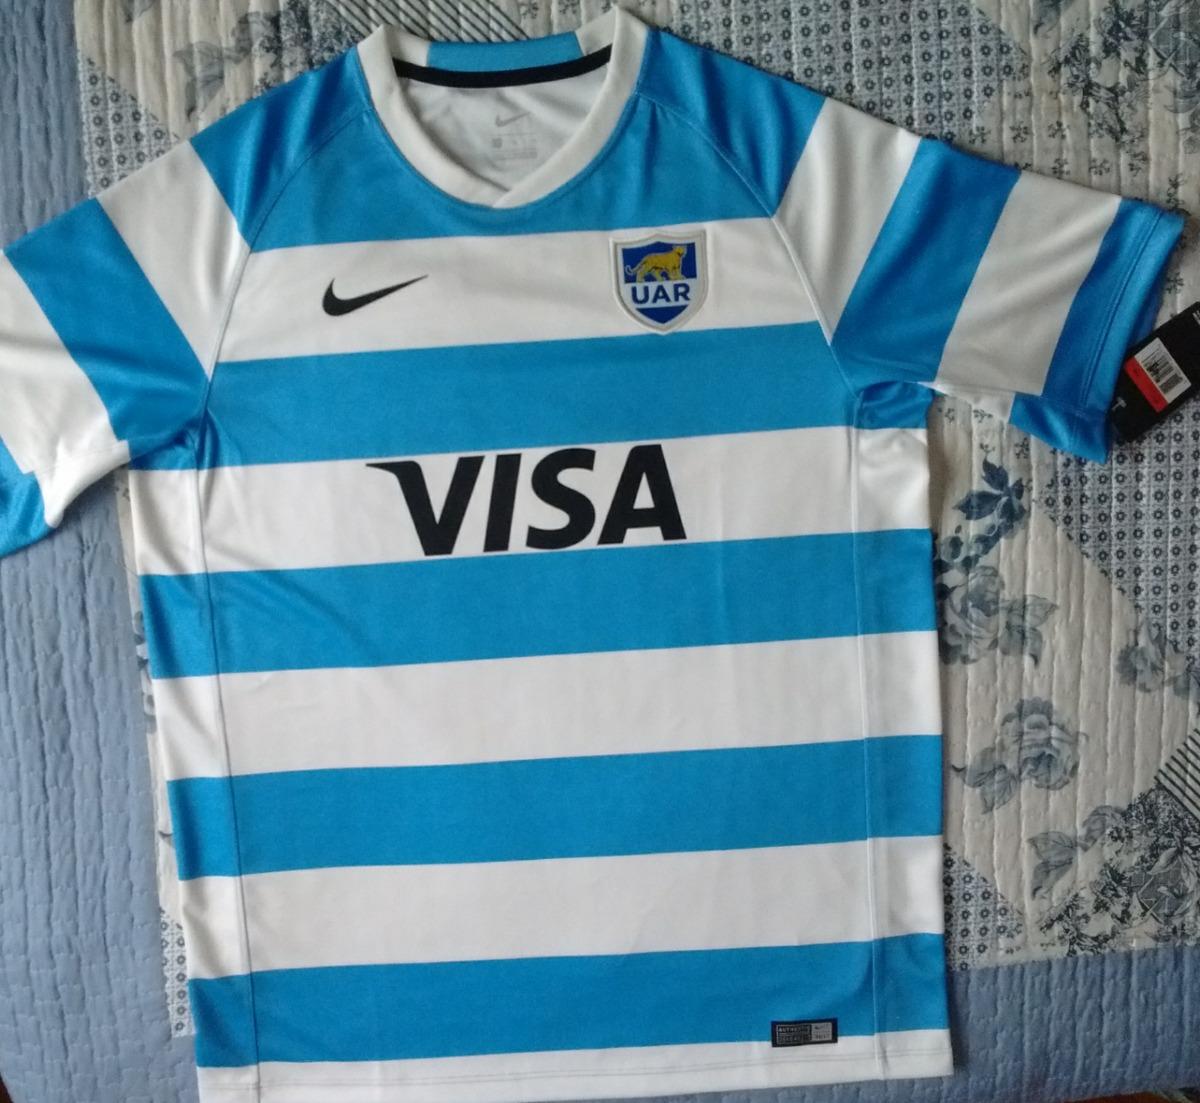 687189a20b camiseta rugby pumas nike 2018 argentina. Cargando zoom.